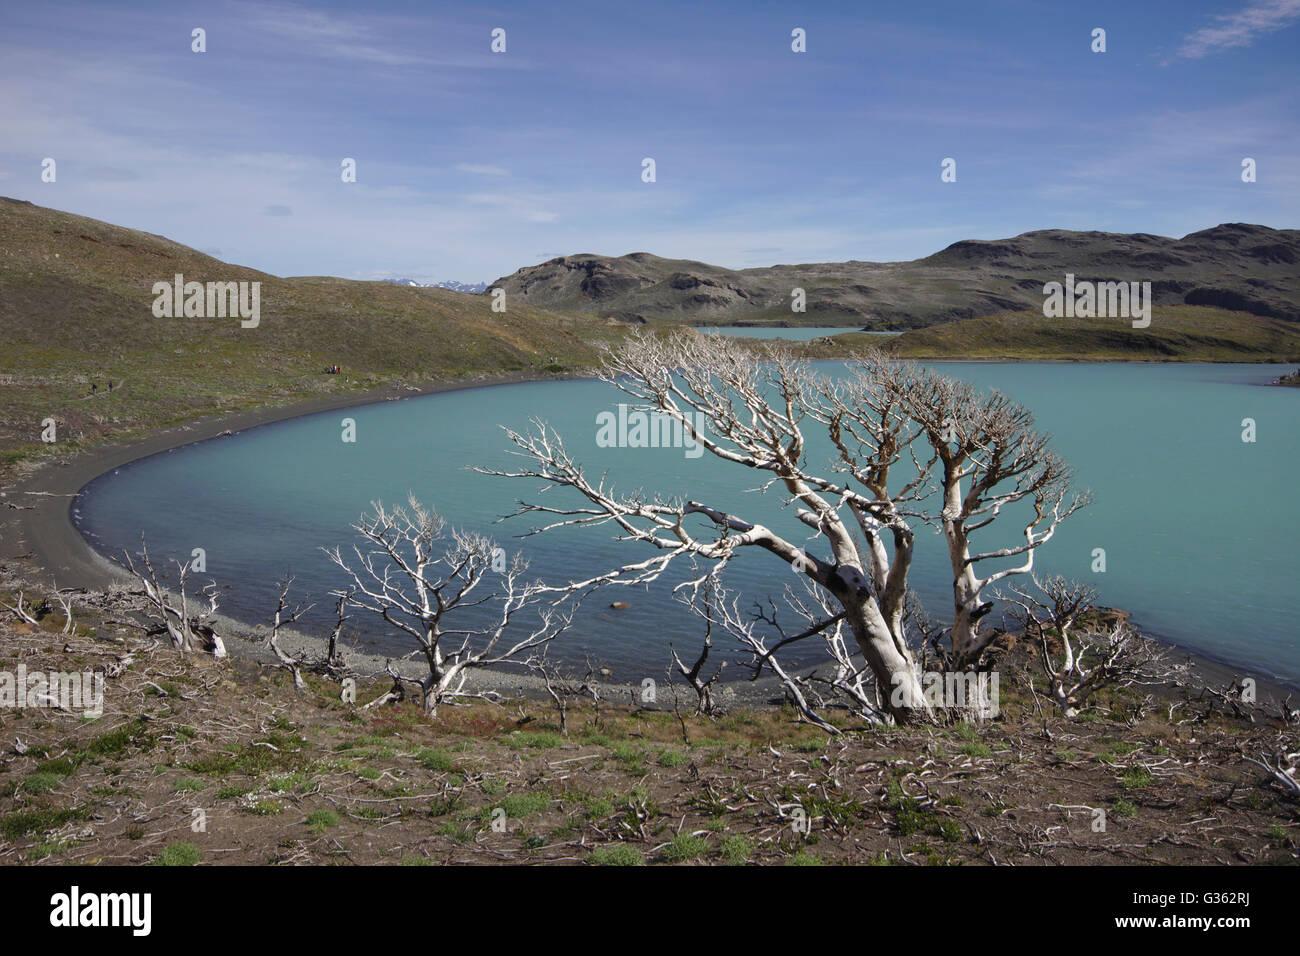 Dead trees after bush fire, Lago Nordenskjöld, Torres del Paine National Park, Chile - Stock Image